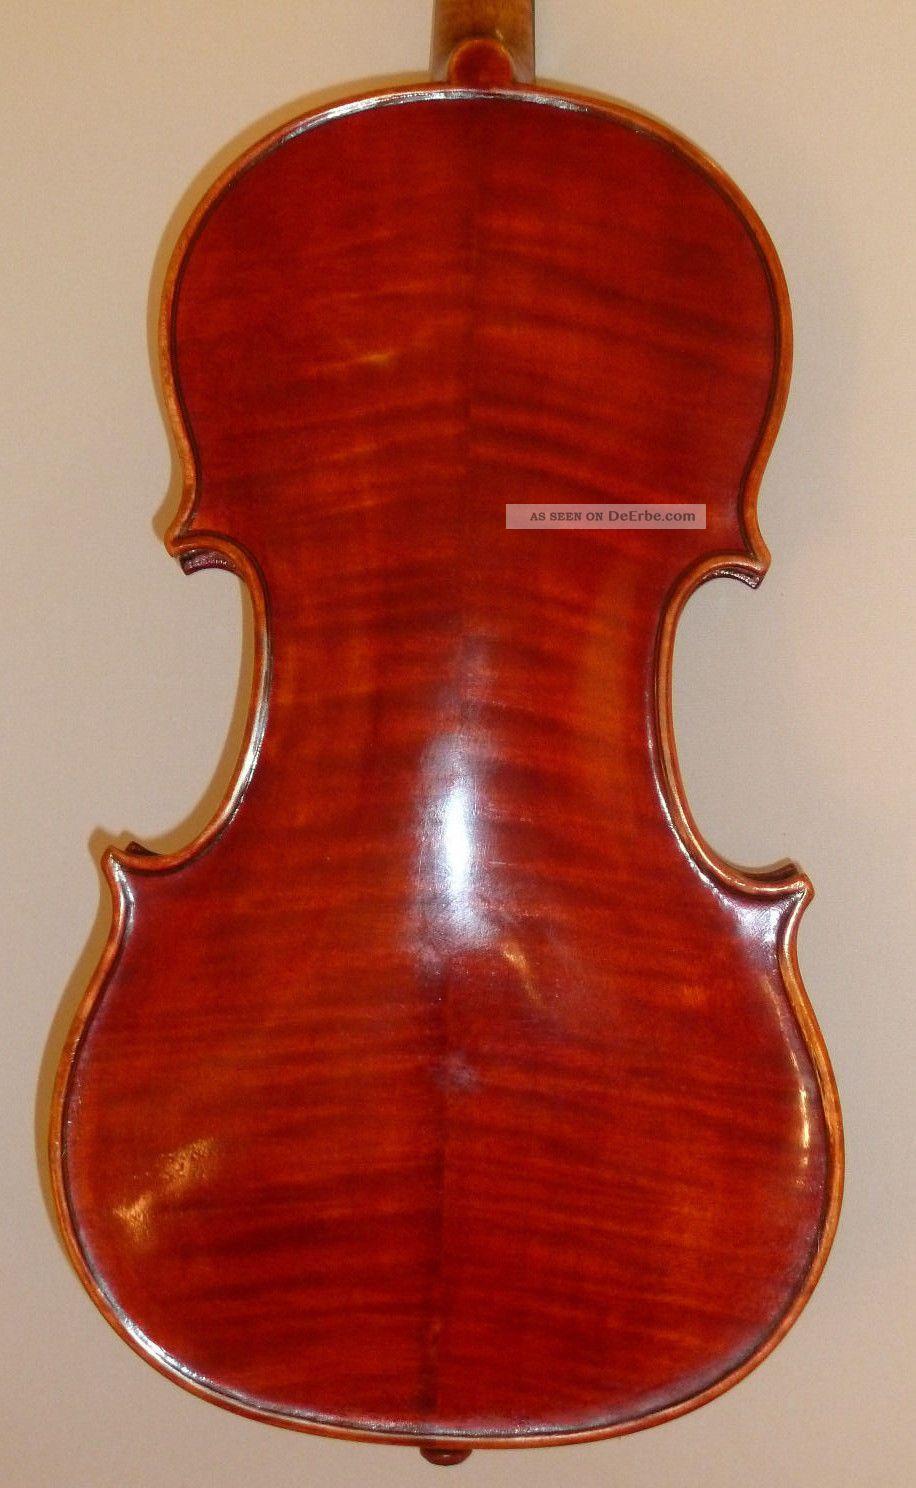 Alte Geige Violine 4/4 Old Violin Italian Labeled Pietro Gallinotti Violino Musikinstrumente Bild